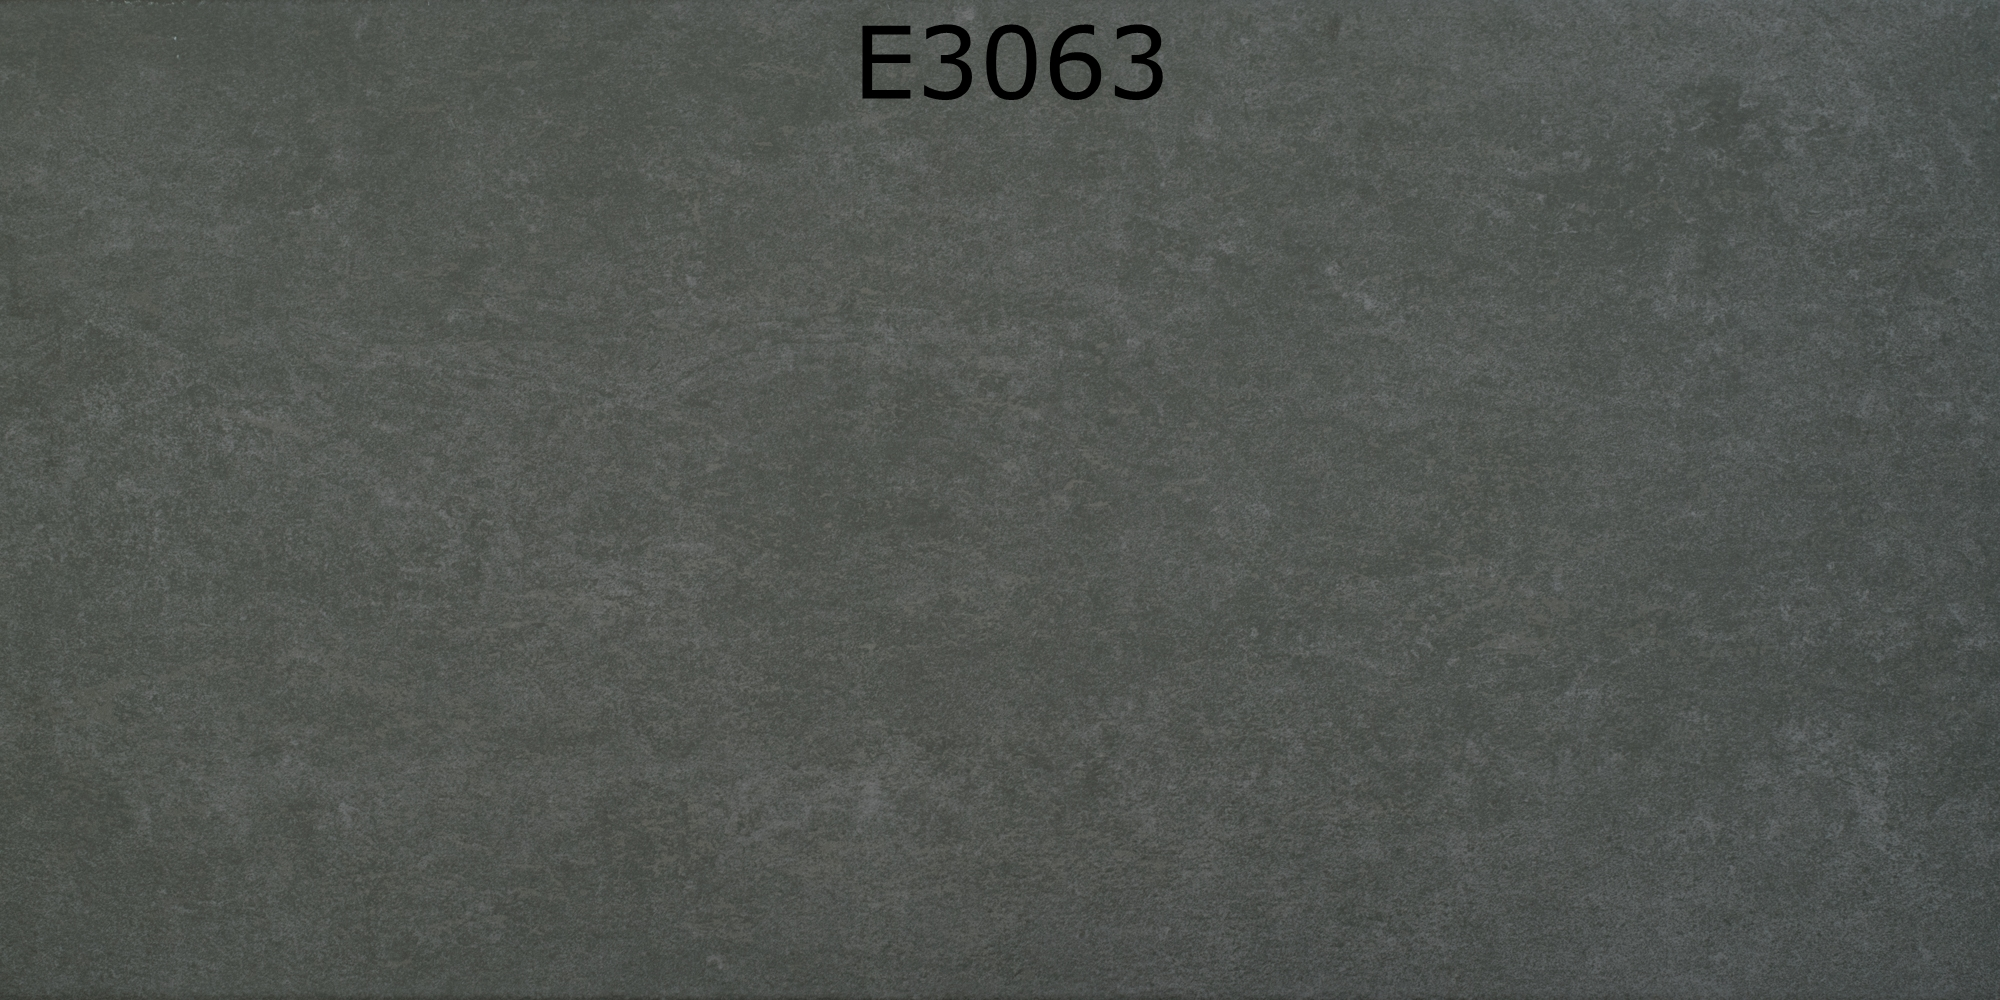 E3063